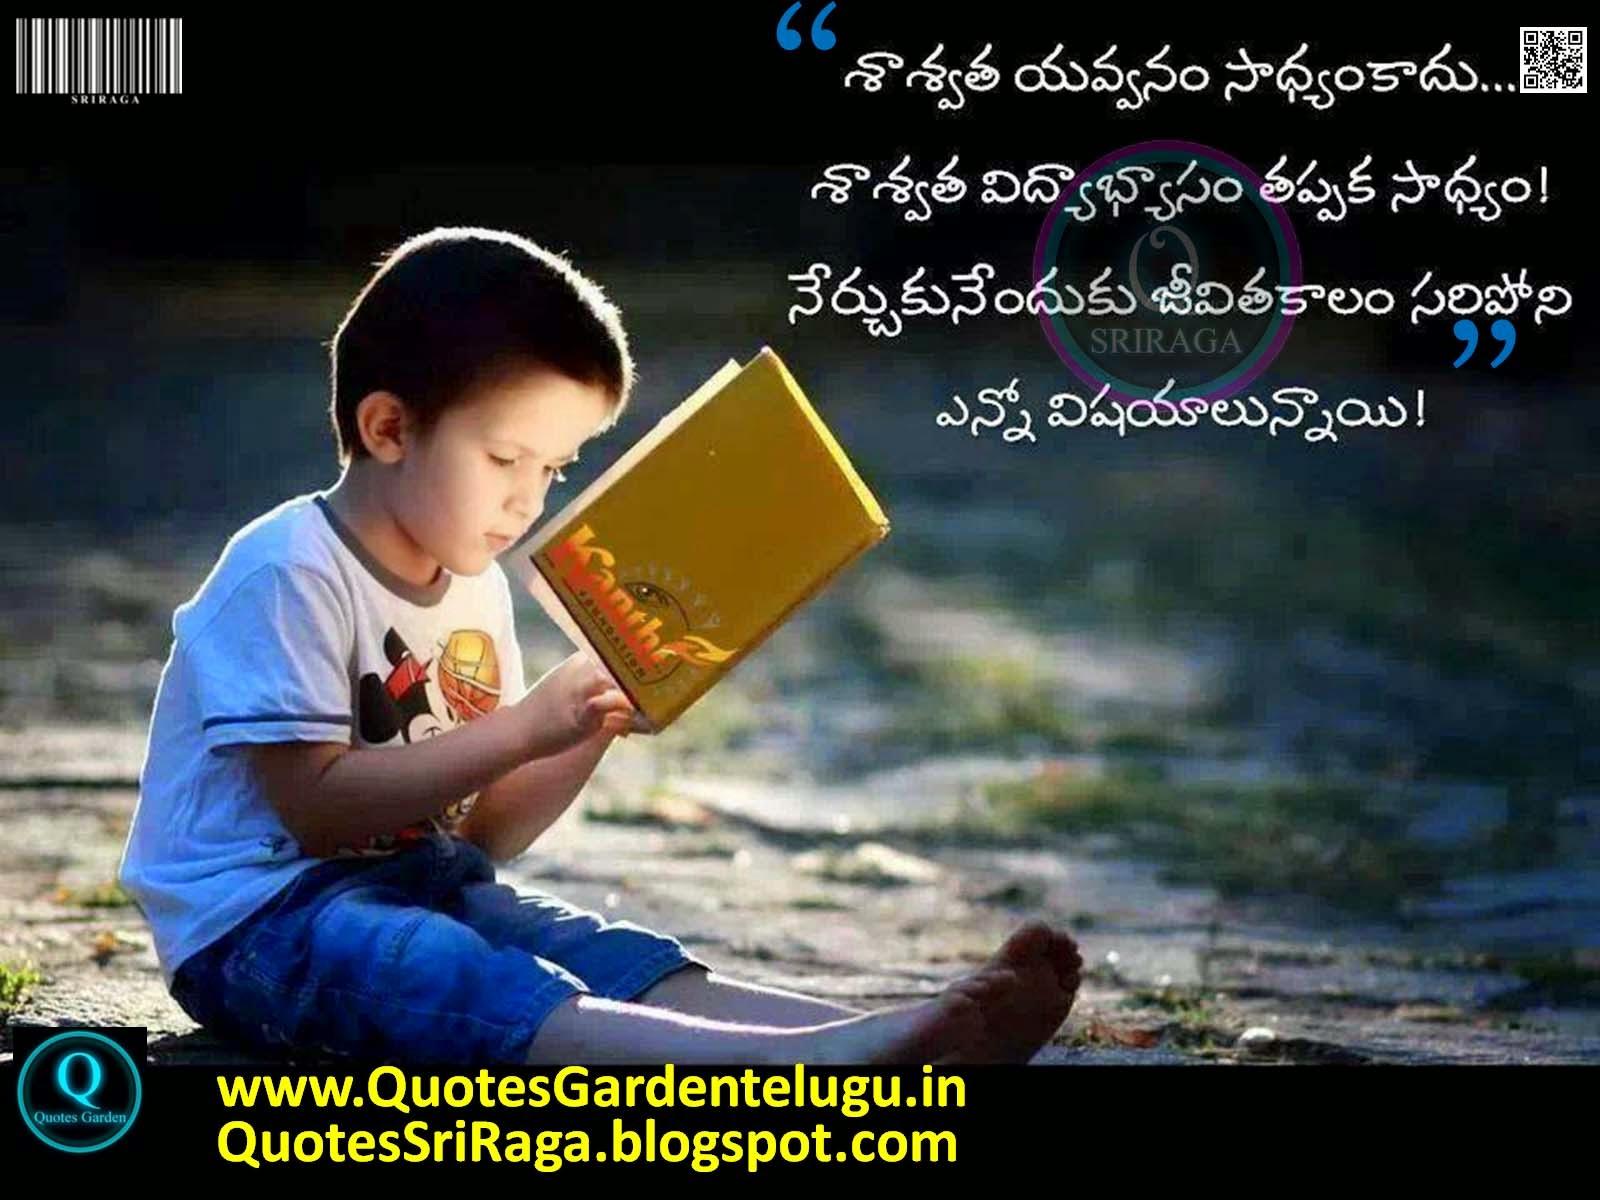 Education life